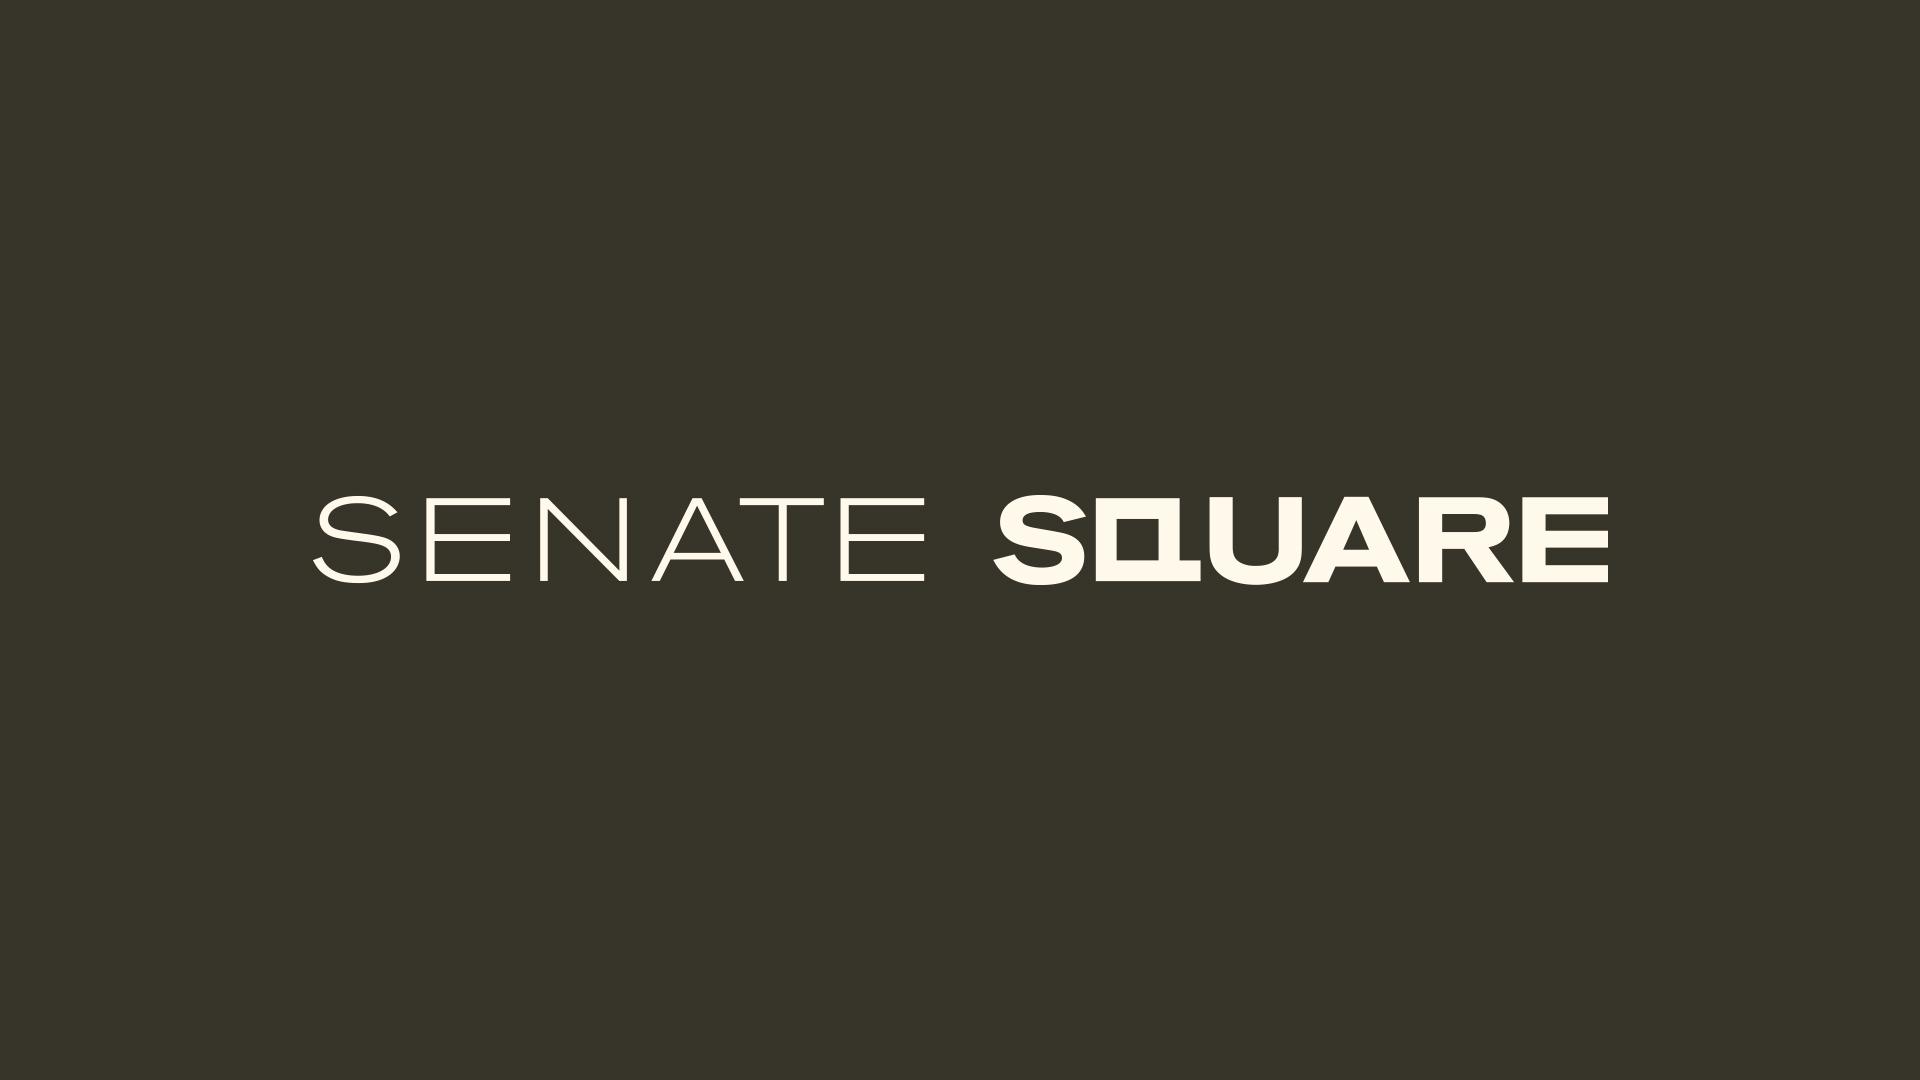 BozSenateSquare-Screens-1080-SCREEN1